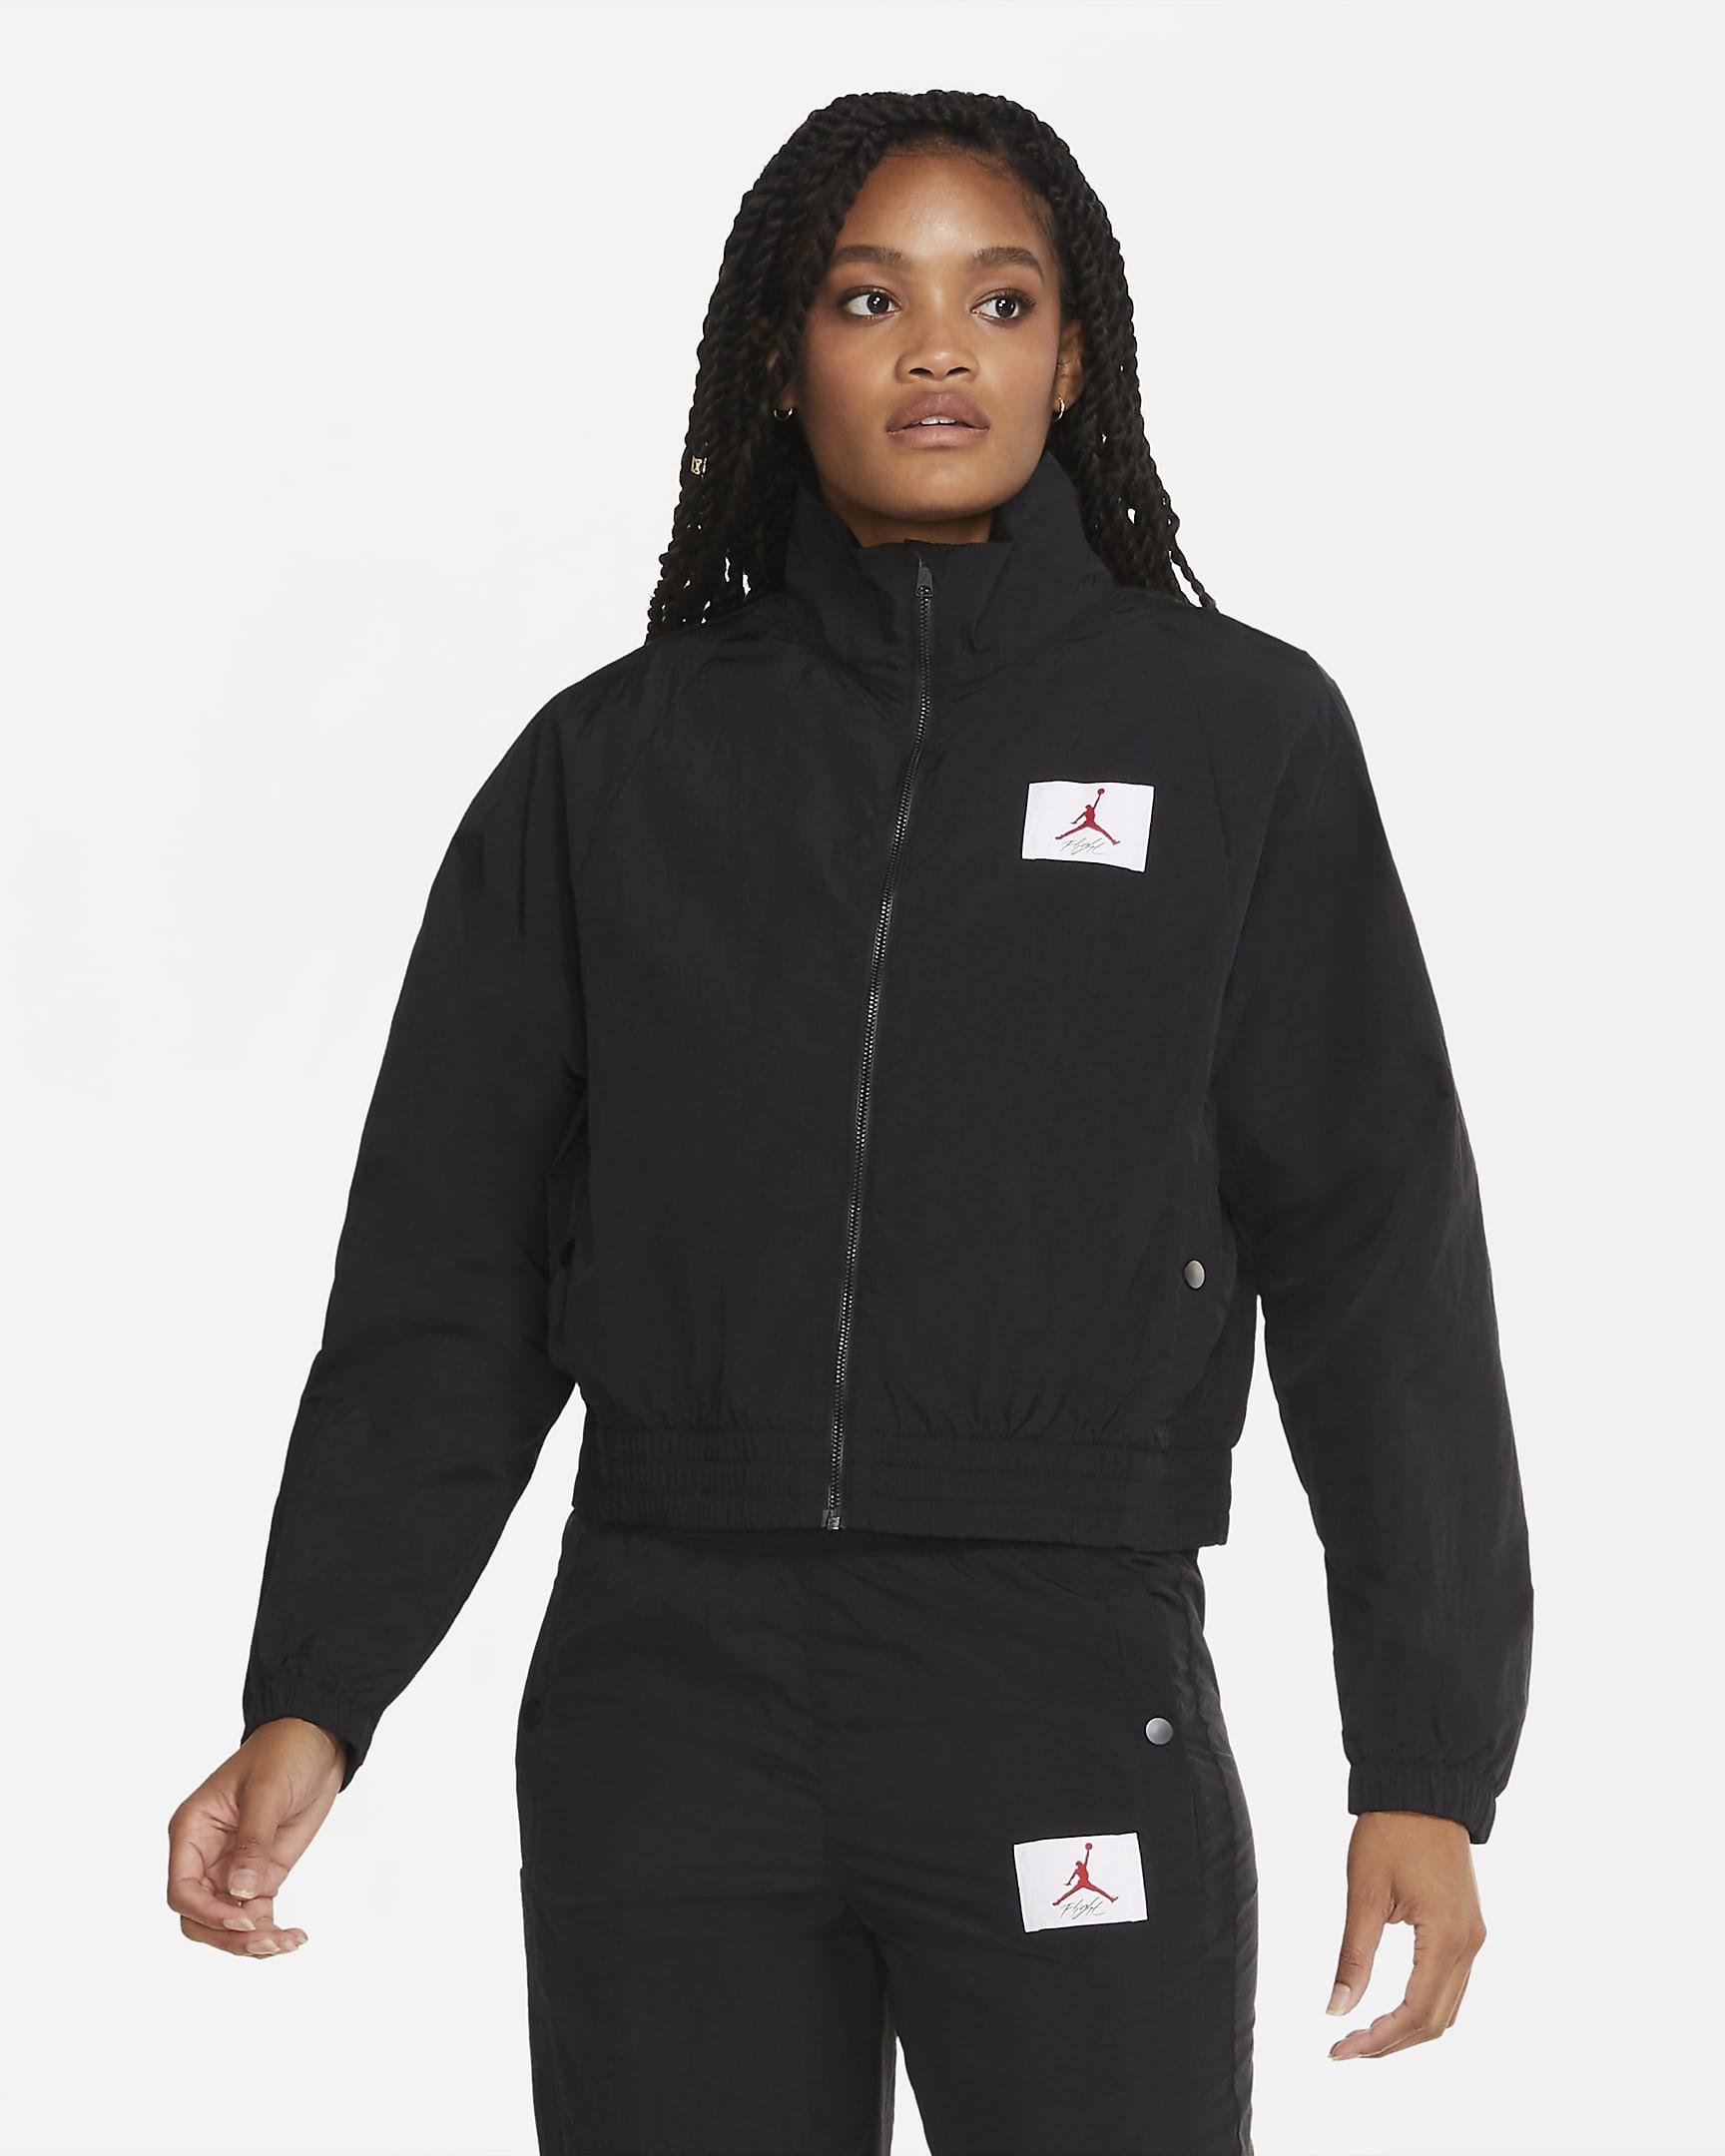 jordan-womens-woven-jacket-dwlC2T